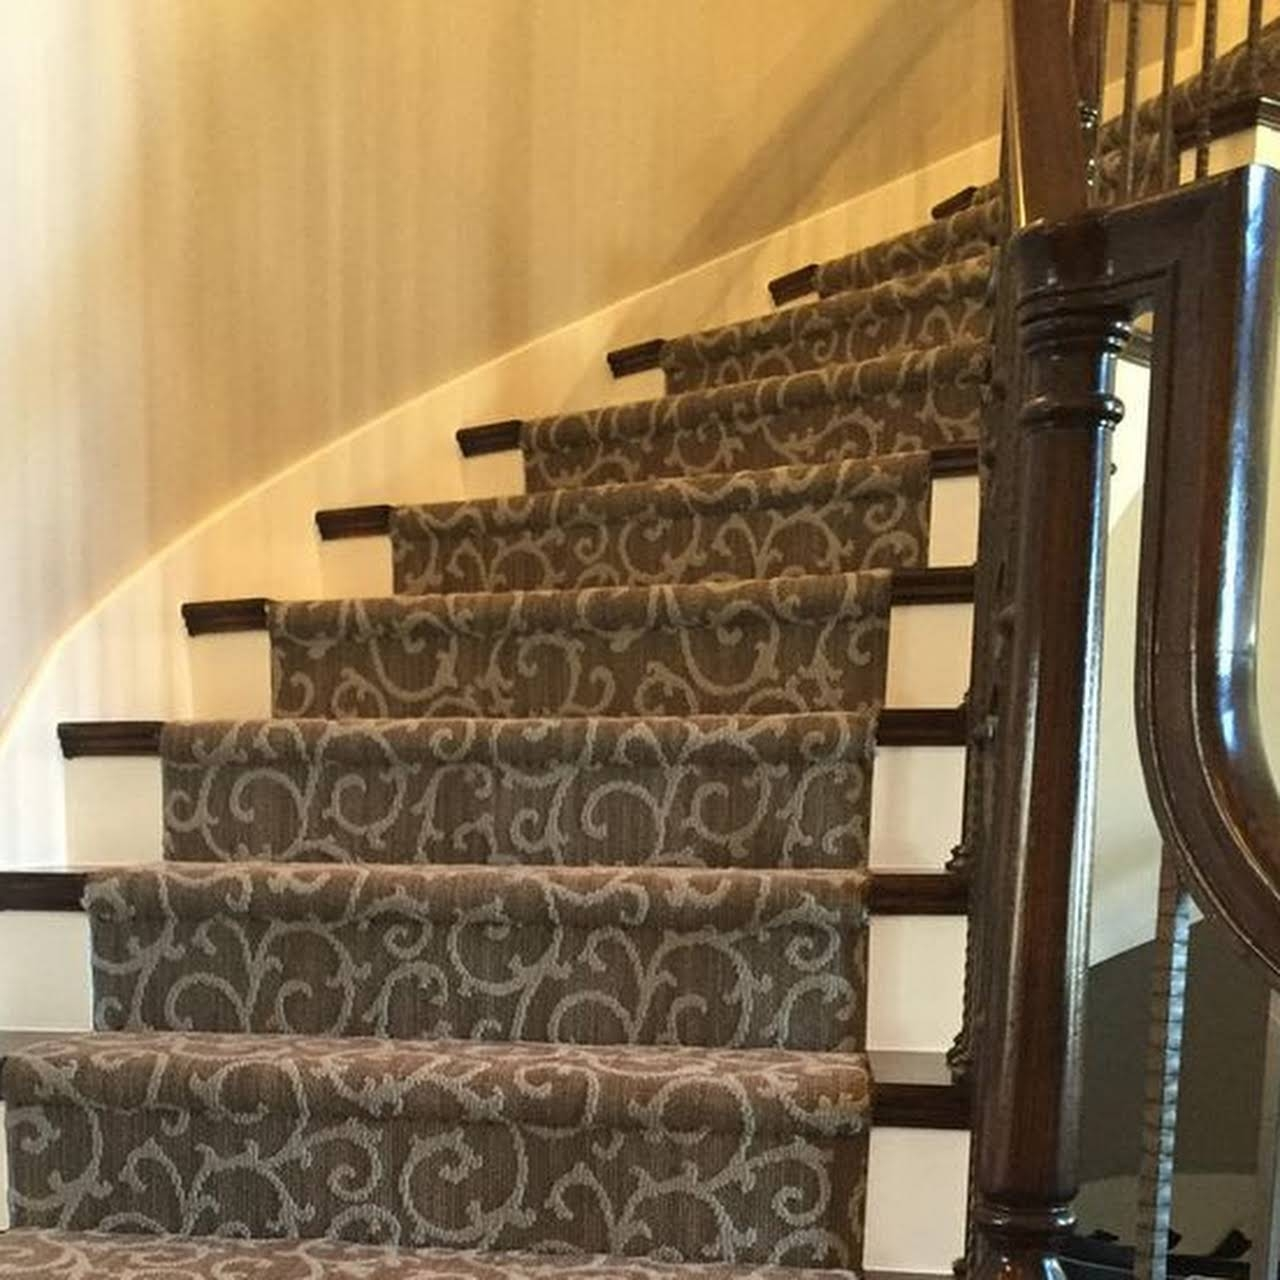 Serge Carpet Plus I Specialize In Carpet Repair Carpet | Seagrass Carpet On Stairs | Gray Wood | Hard Wearing | Grey | Stair Malay Chen Sisal | 80 20 Wool Carpet Stair